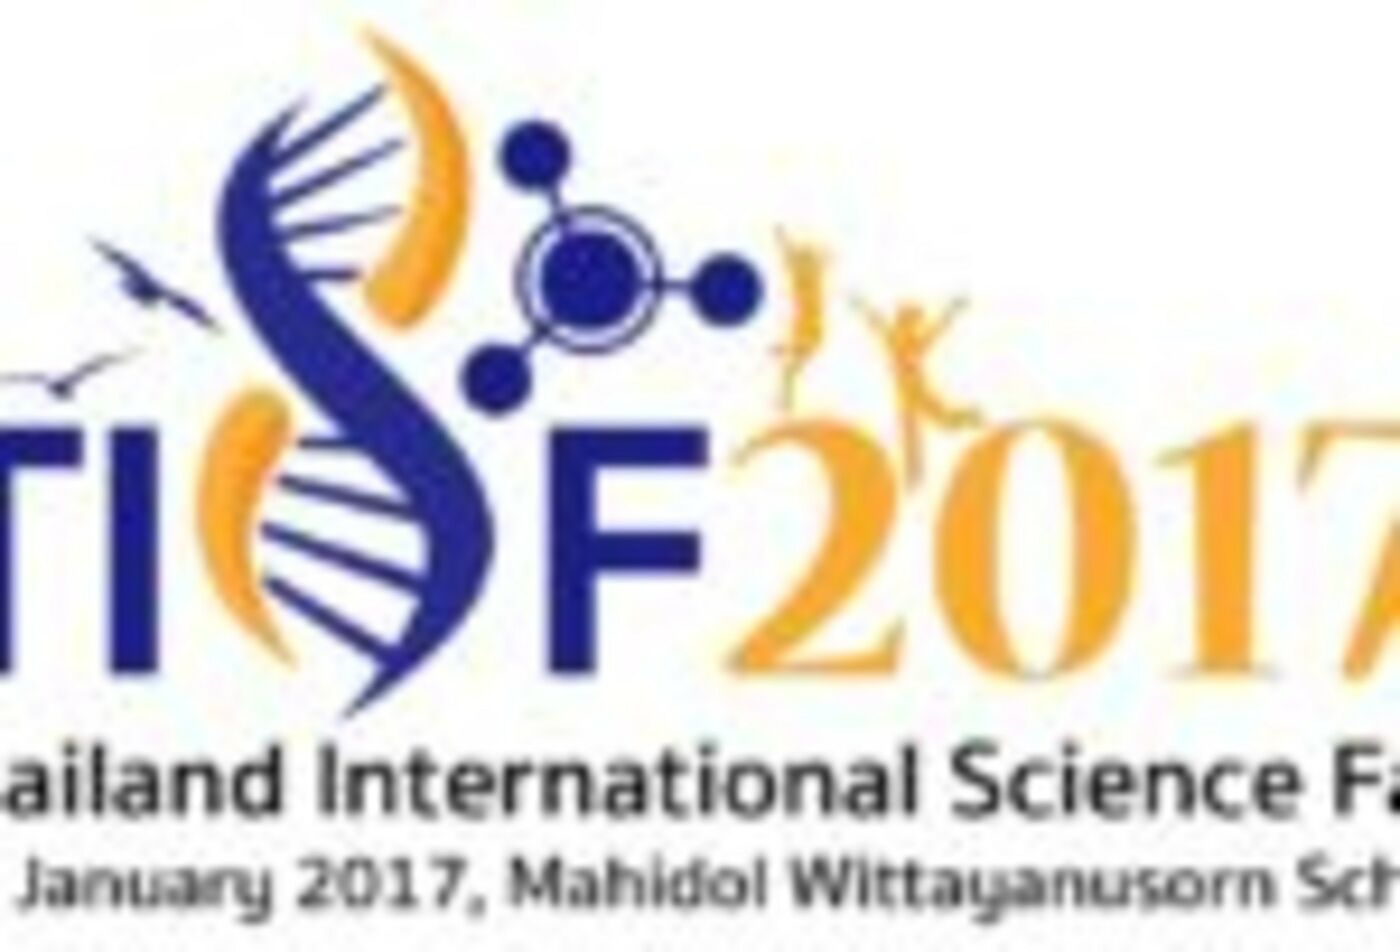 Thailand International Science Fair 2017